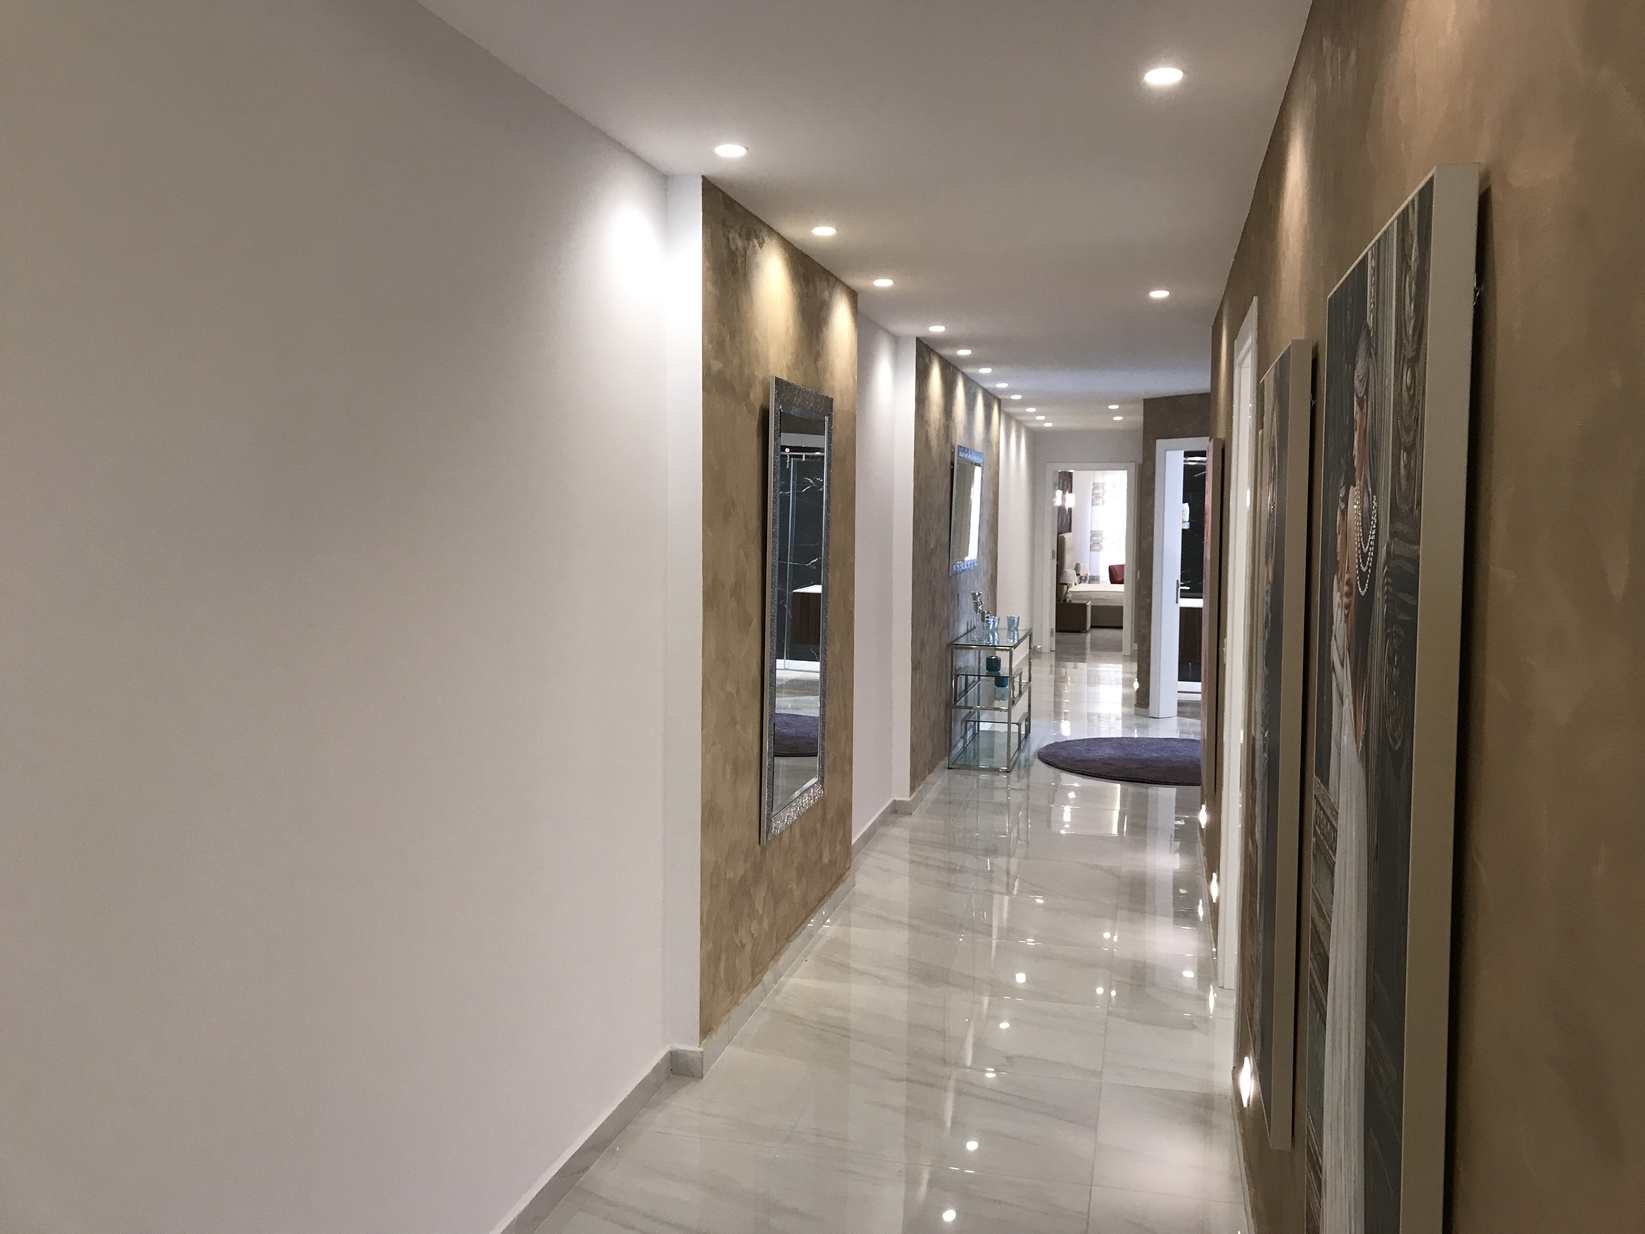 3 bed Apartment For Rent in Qawra, Qawra - thumb 26